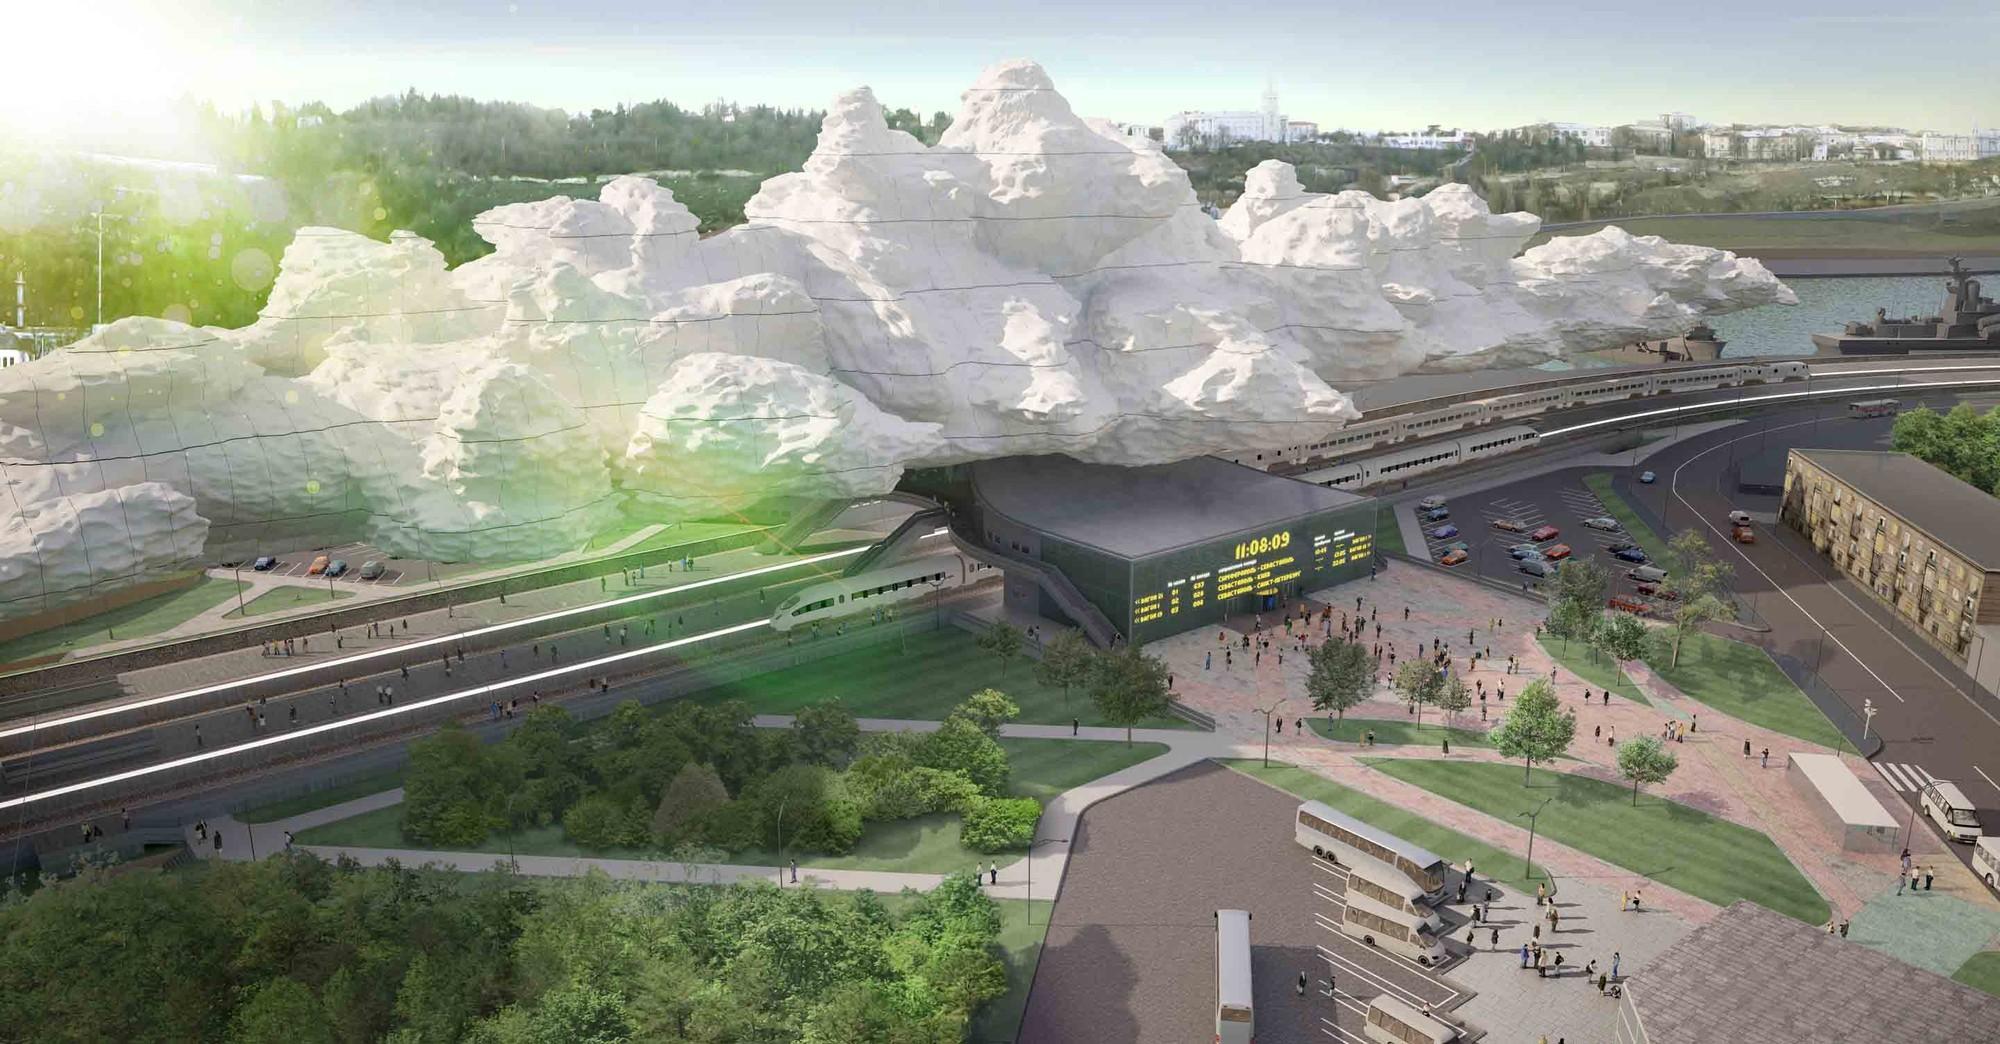 'Under the Cloud' Railway Station Proposal / Arthur Kupreychuk, Courtesy of Arthur Kupreychuk